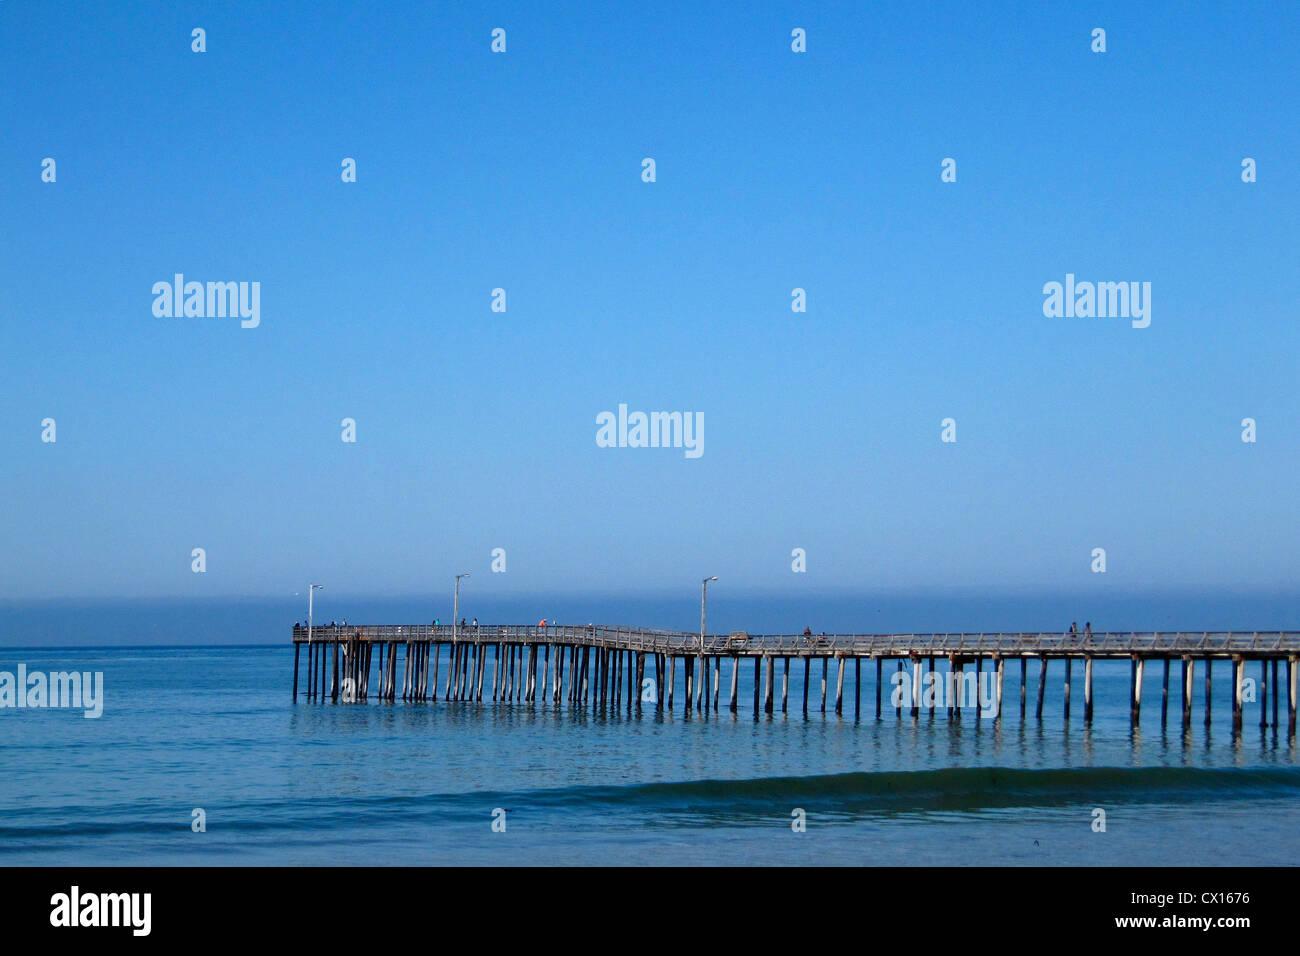 United States of America, California, Cayucos  - Stock Image